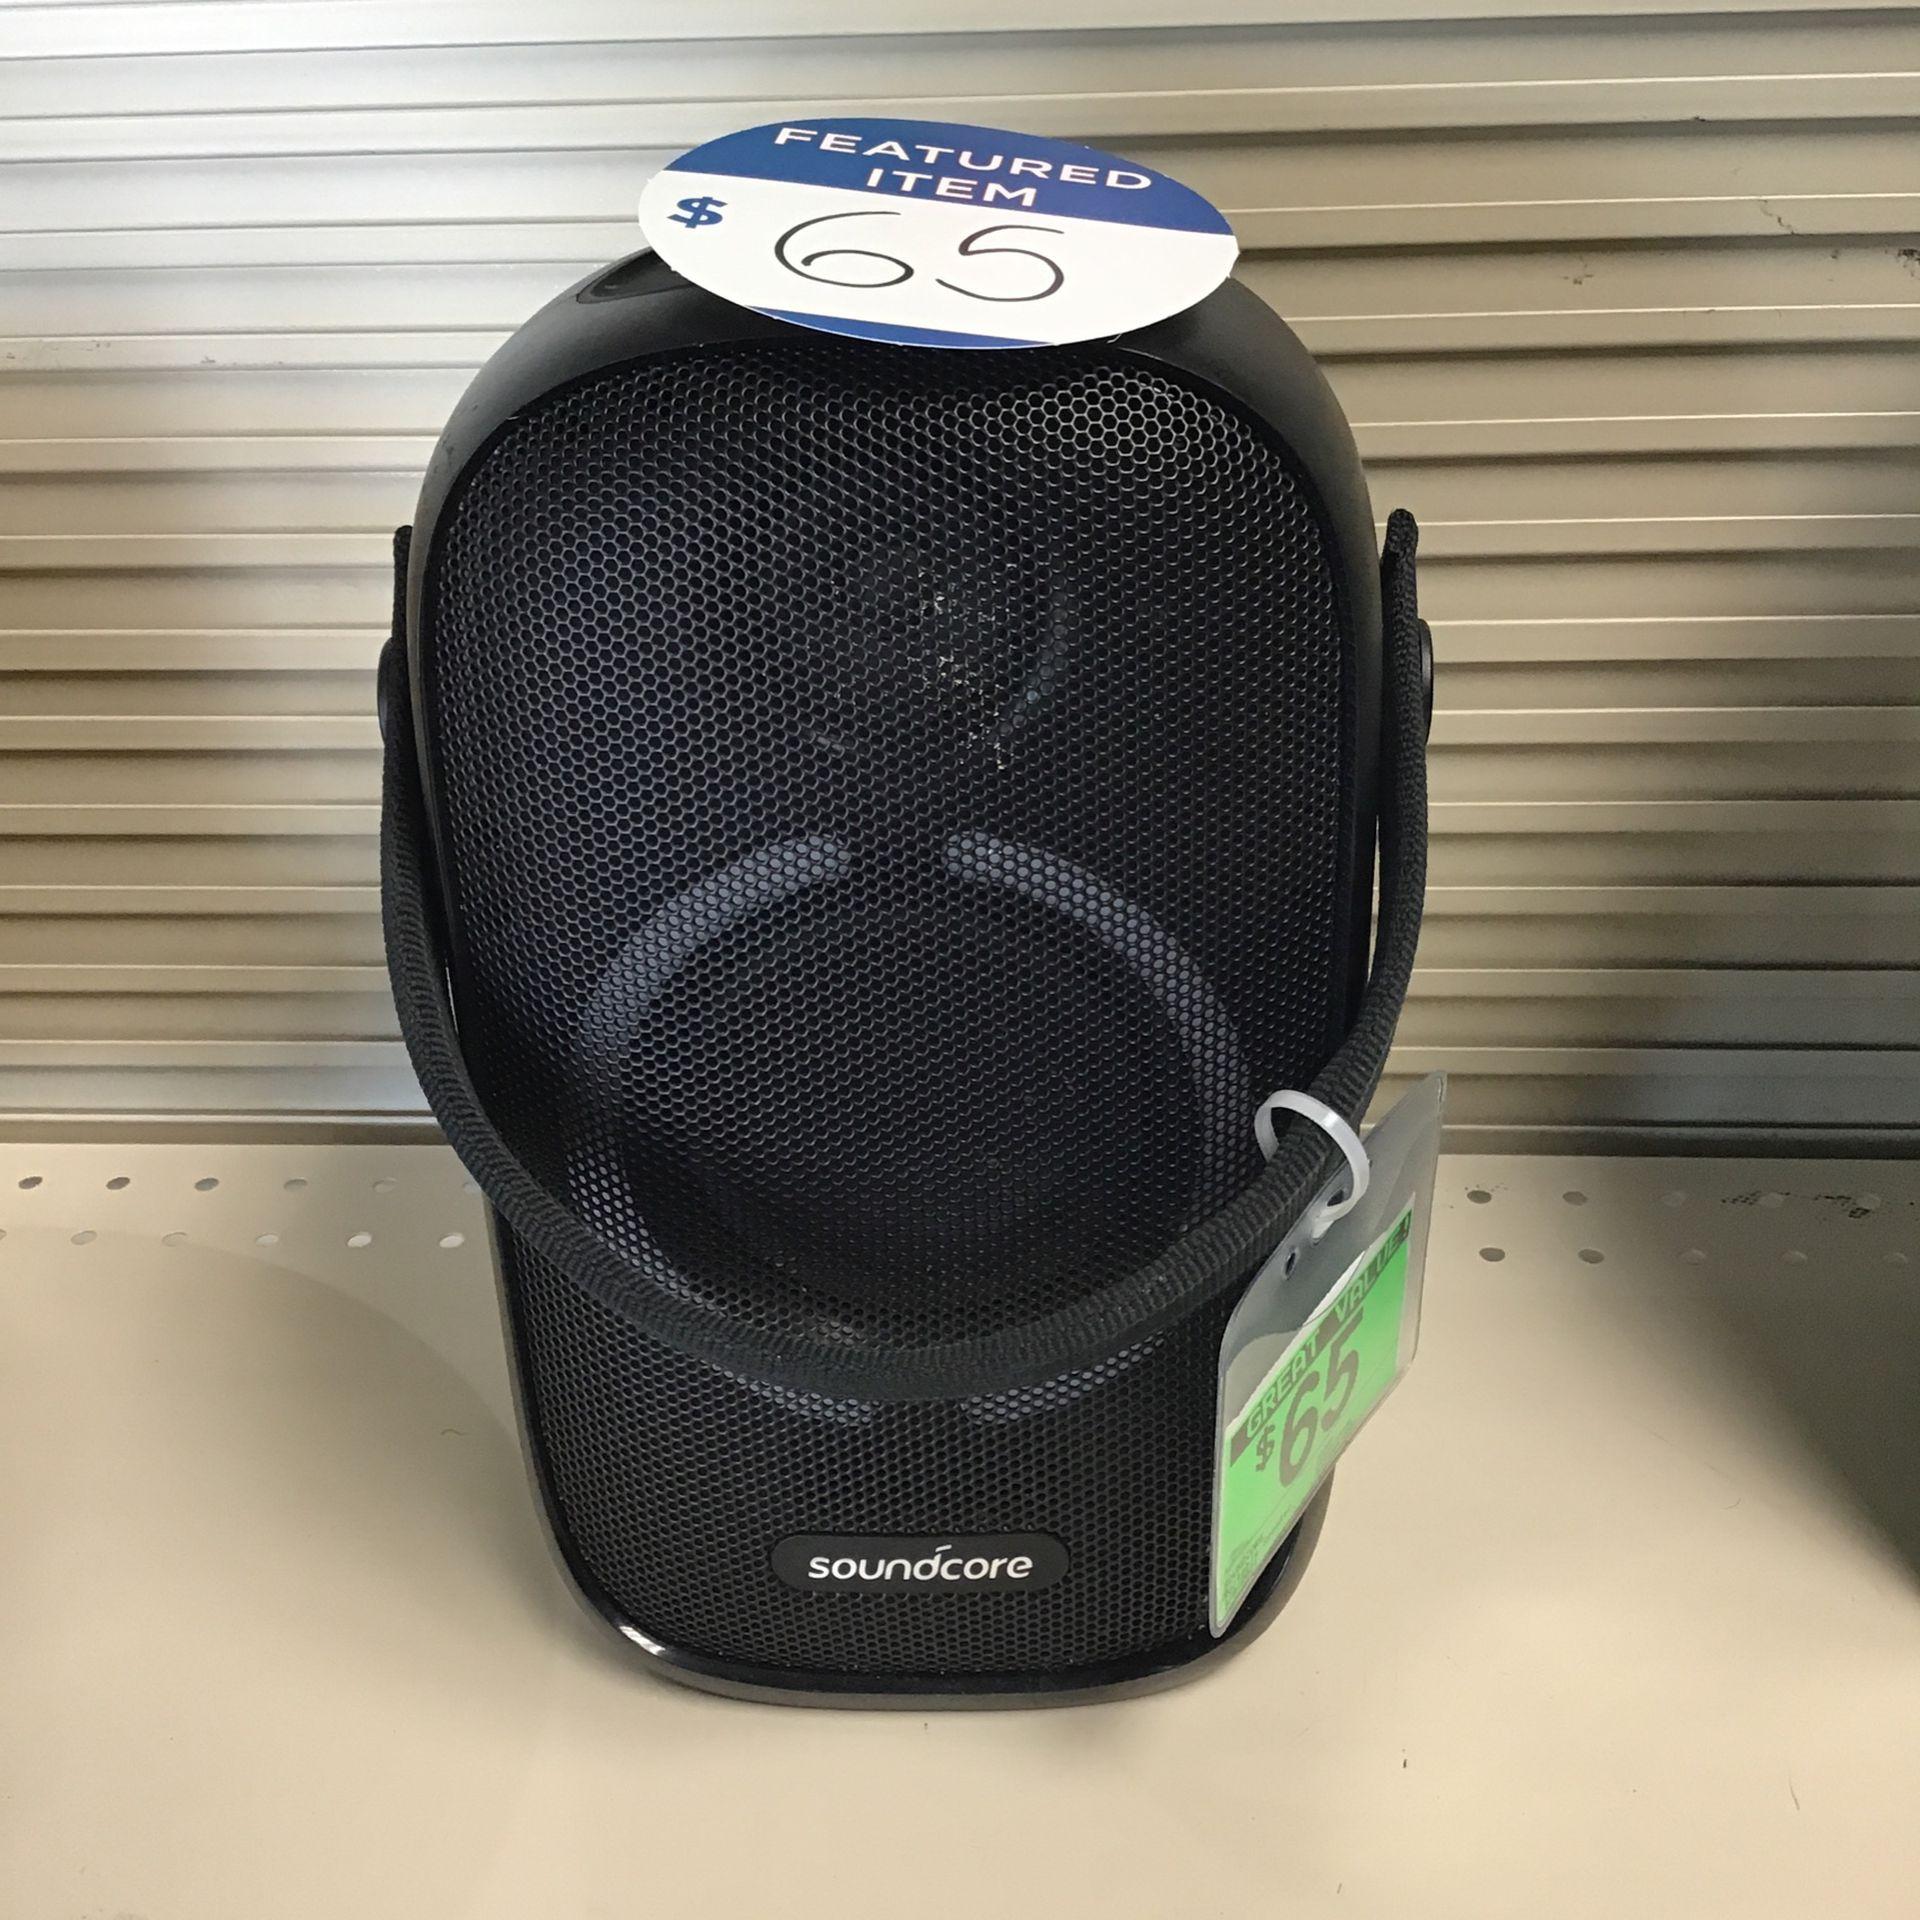 Sound core rave Neil portable Bluetooth speaker